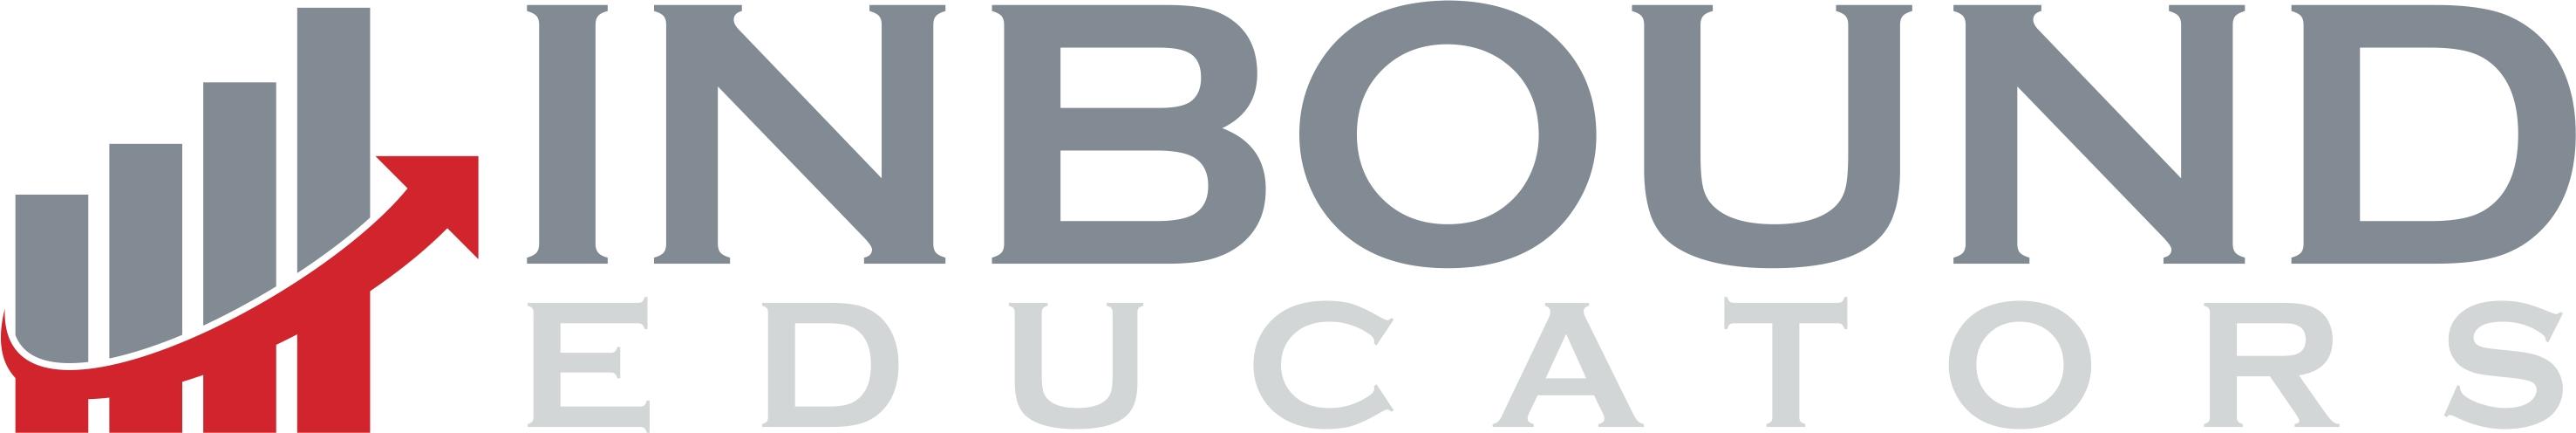 Inbound_Educators_Logo_jpeg.jpg